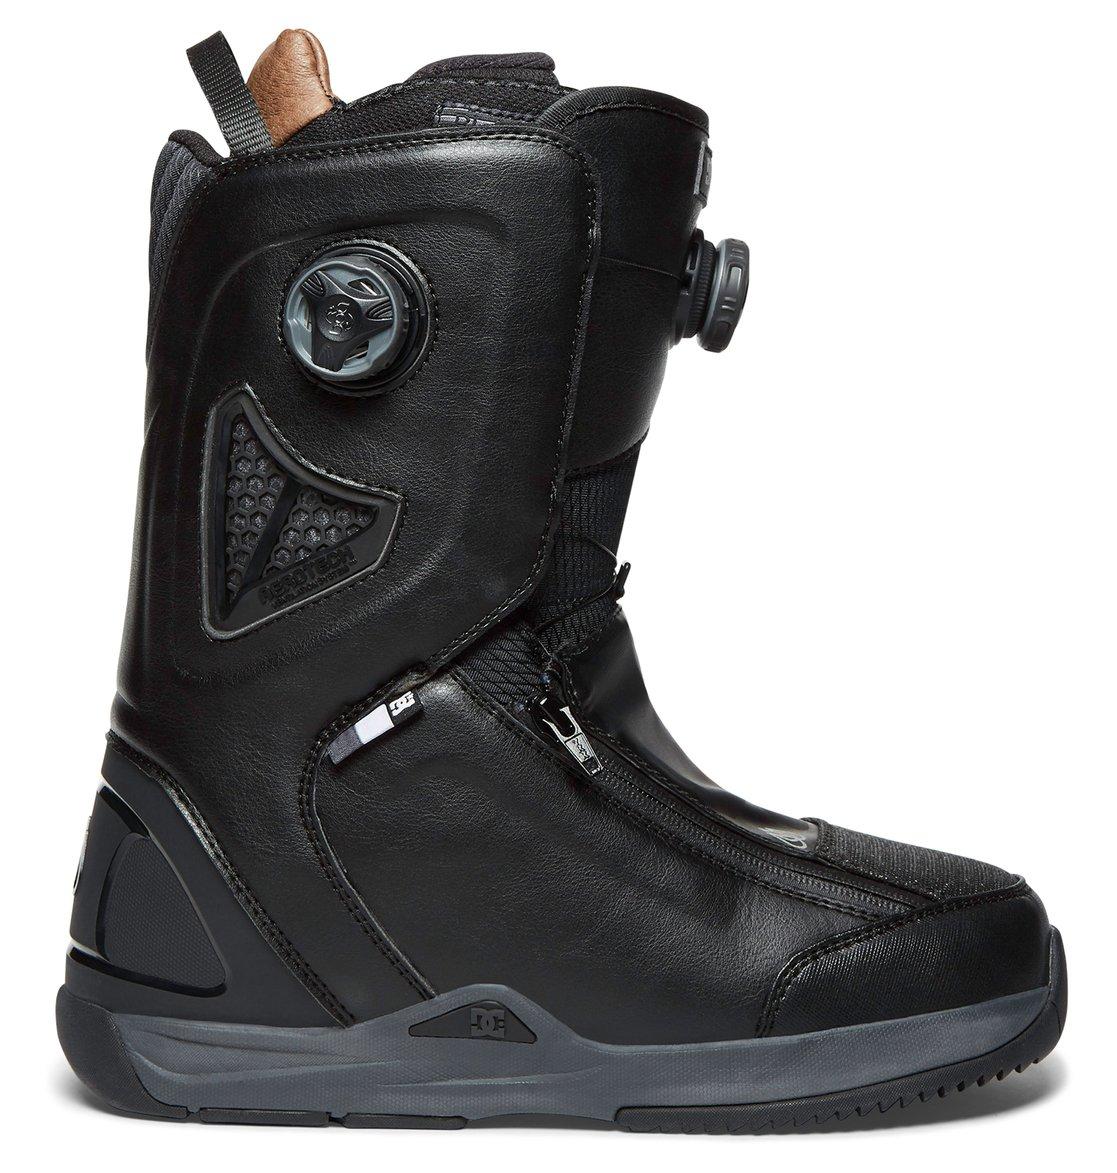 8ae3abe41b2 Travis Rice BOA Snowboard Boots ADYO100029 | DC Shoes